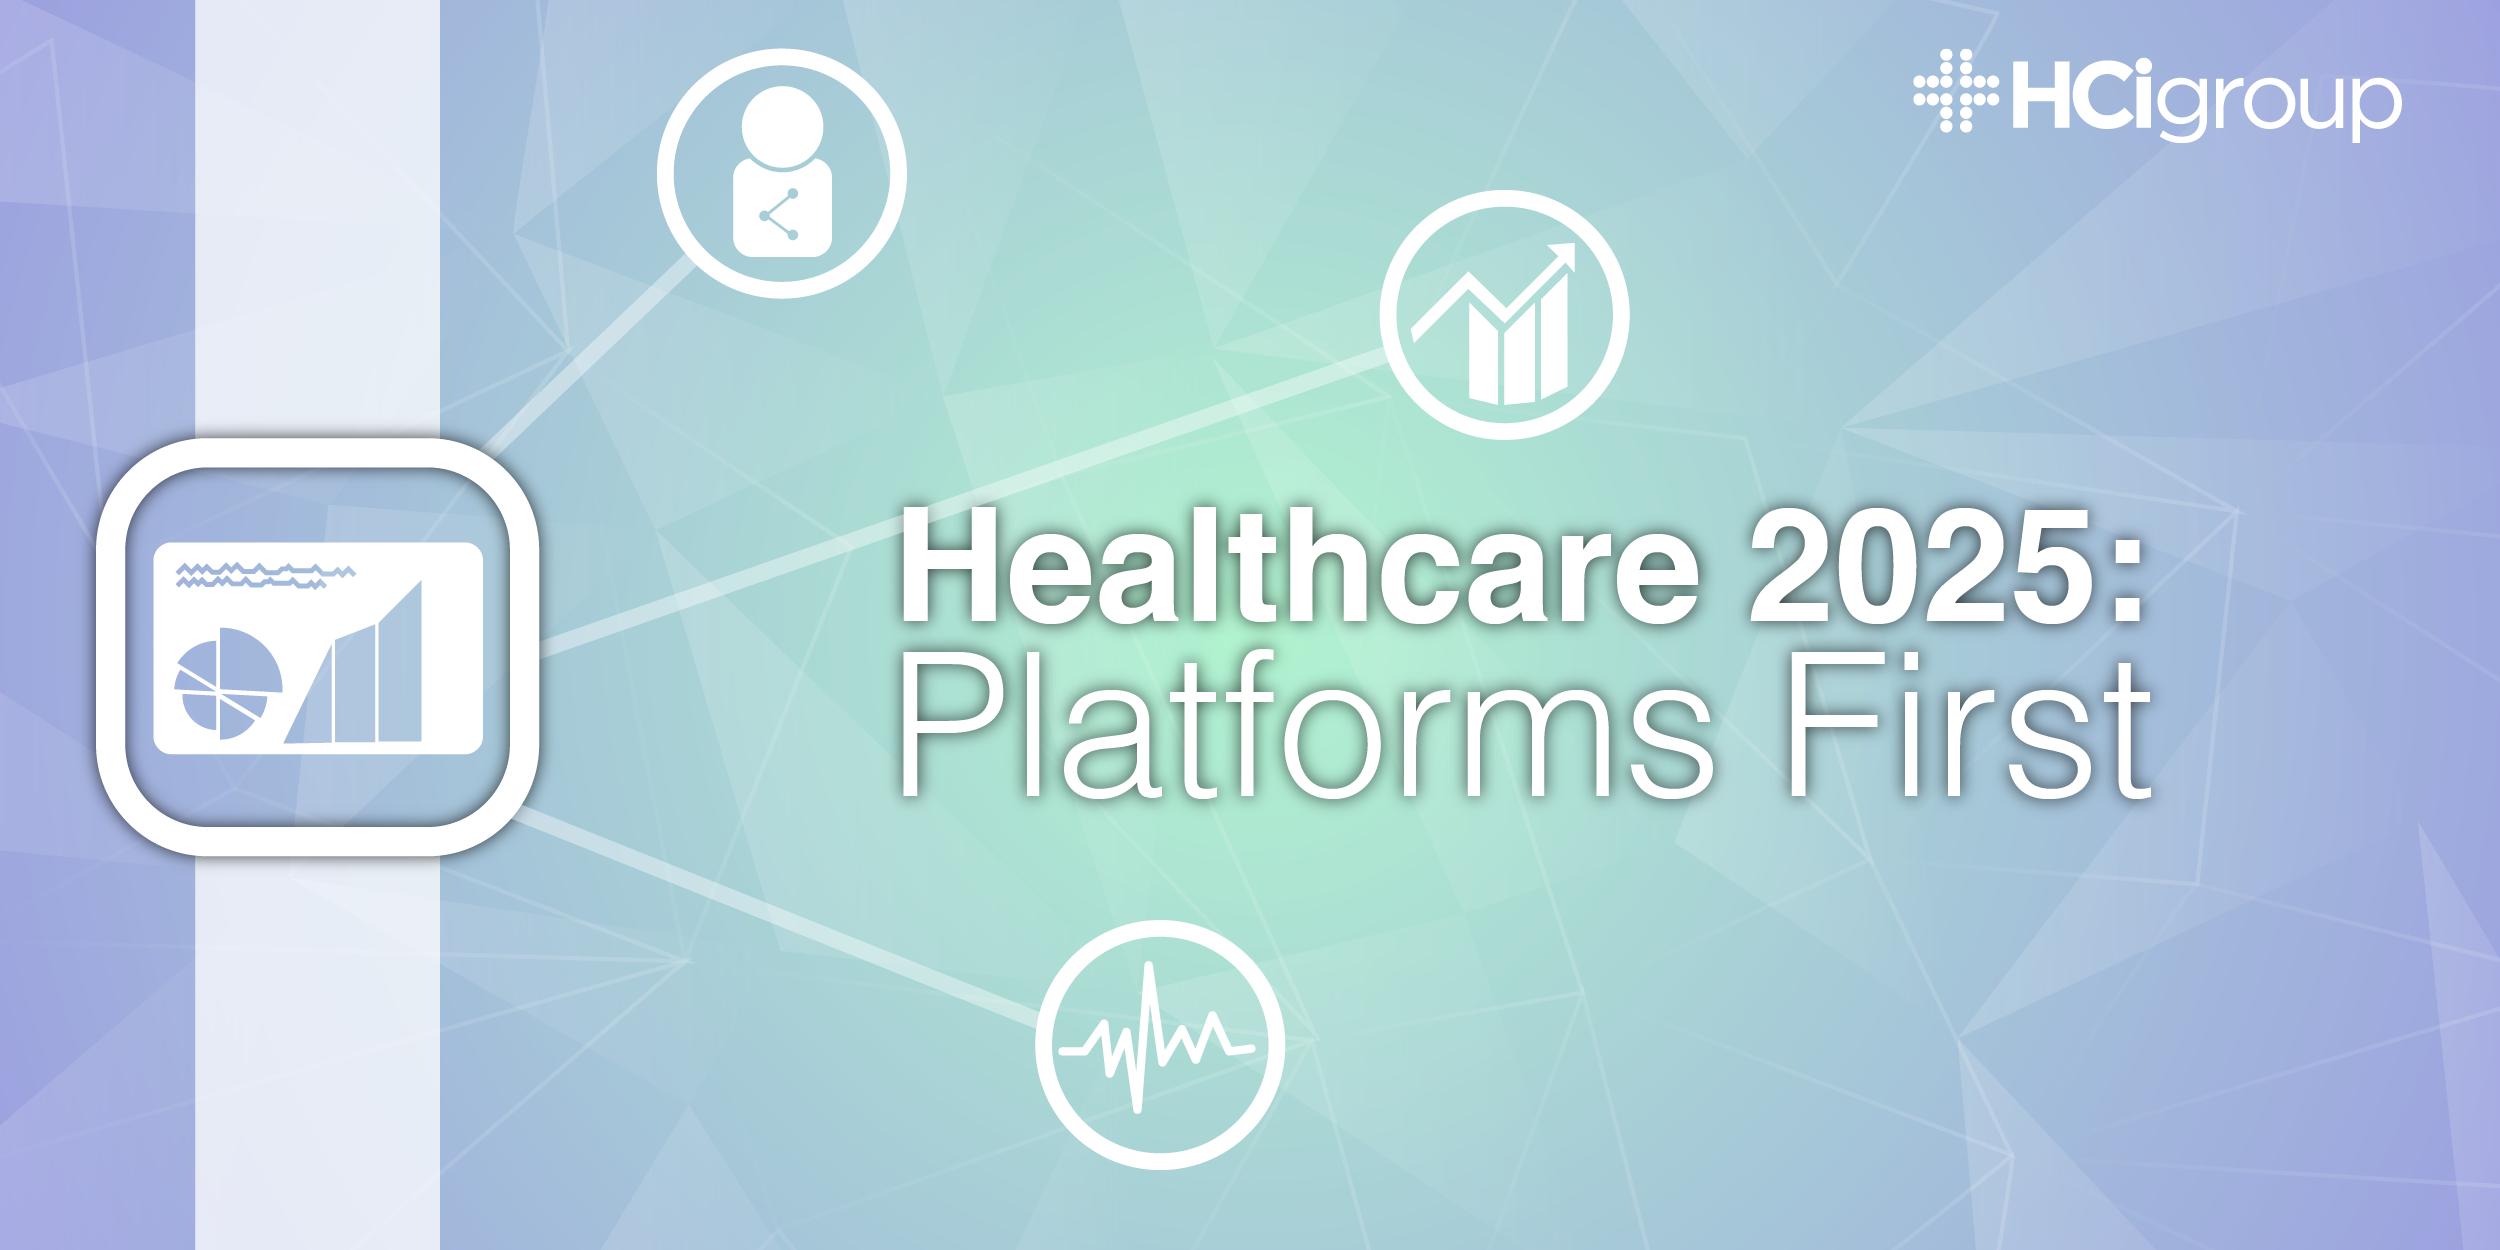 Healthcare 2025: Digital Healthcare Platforms First